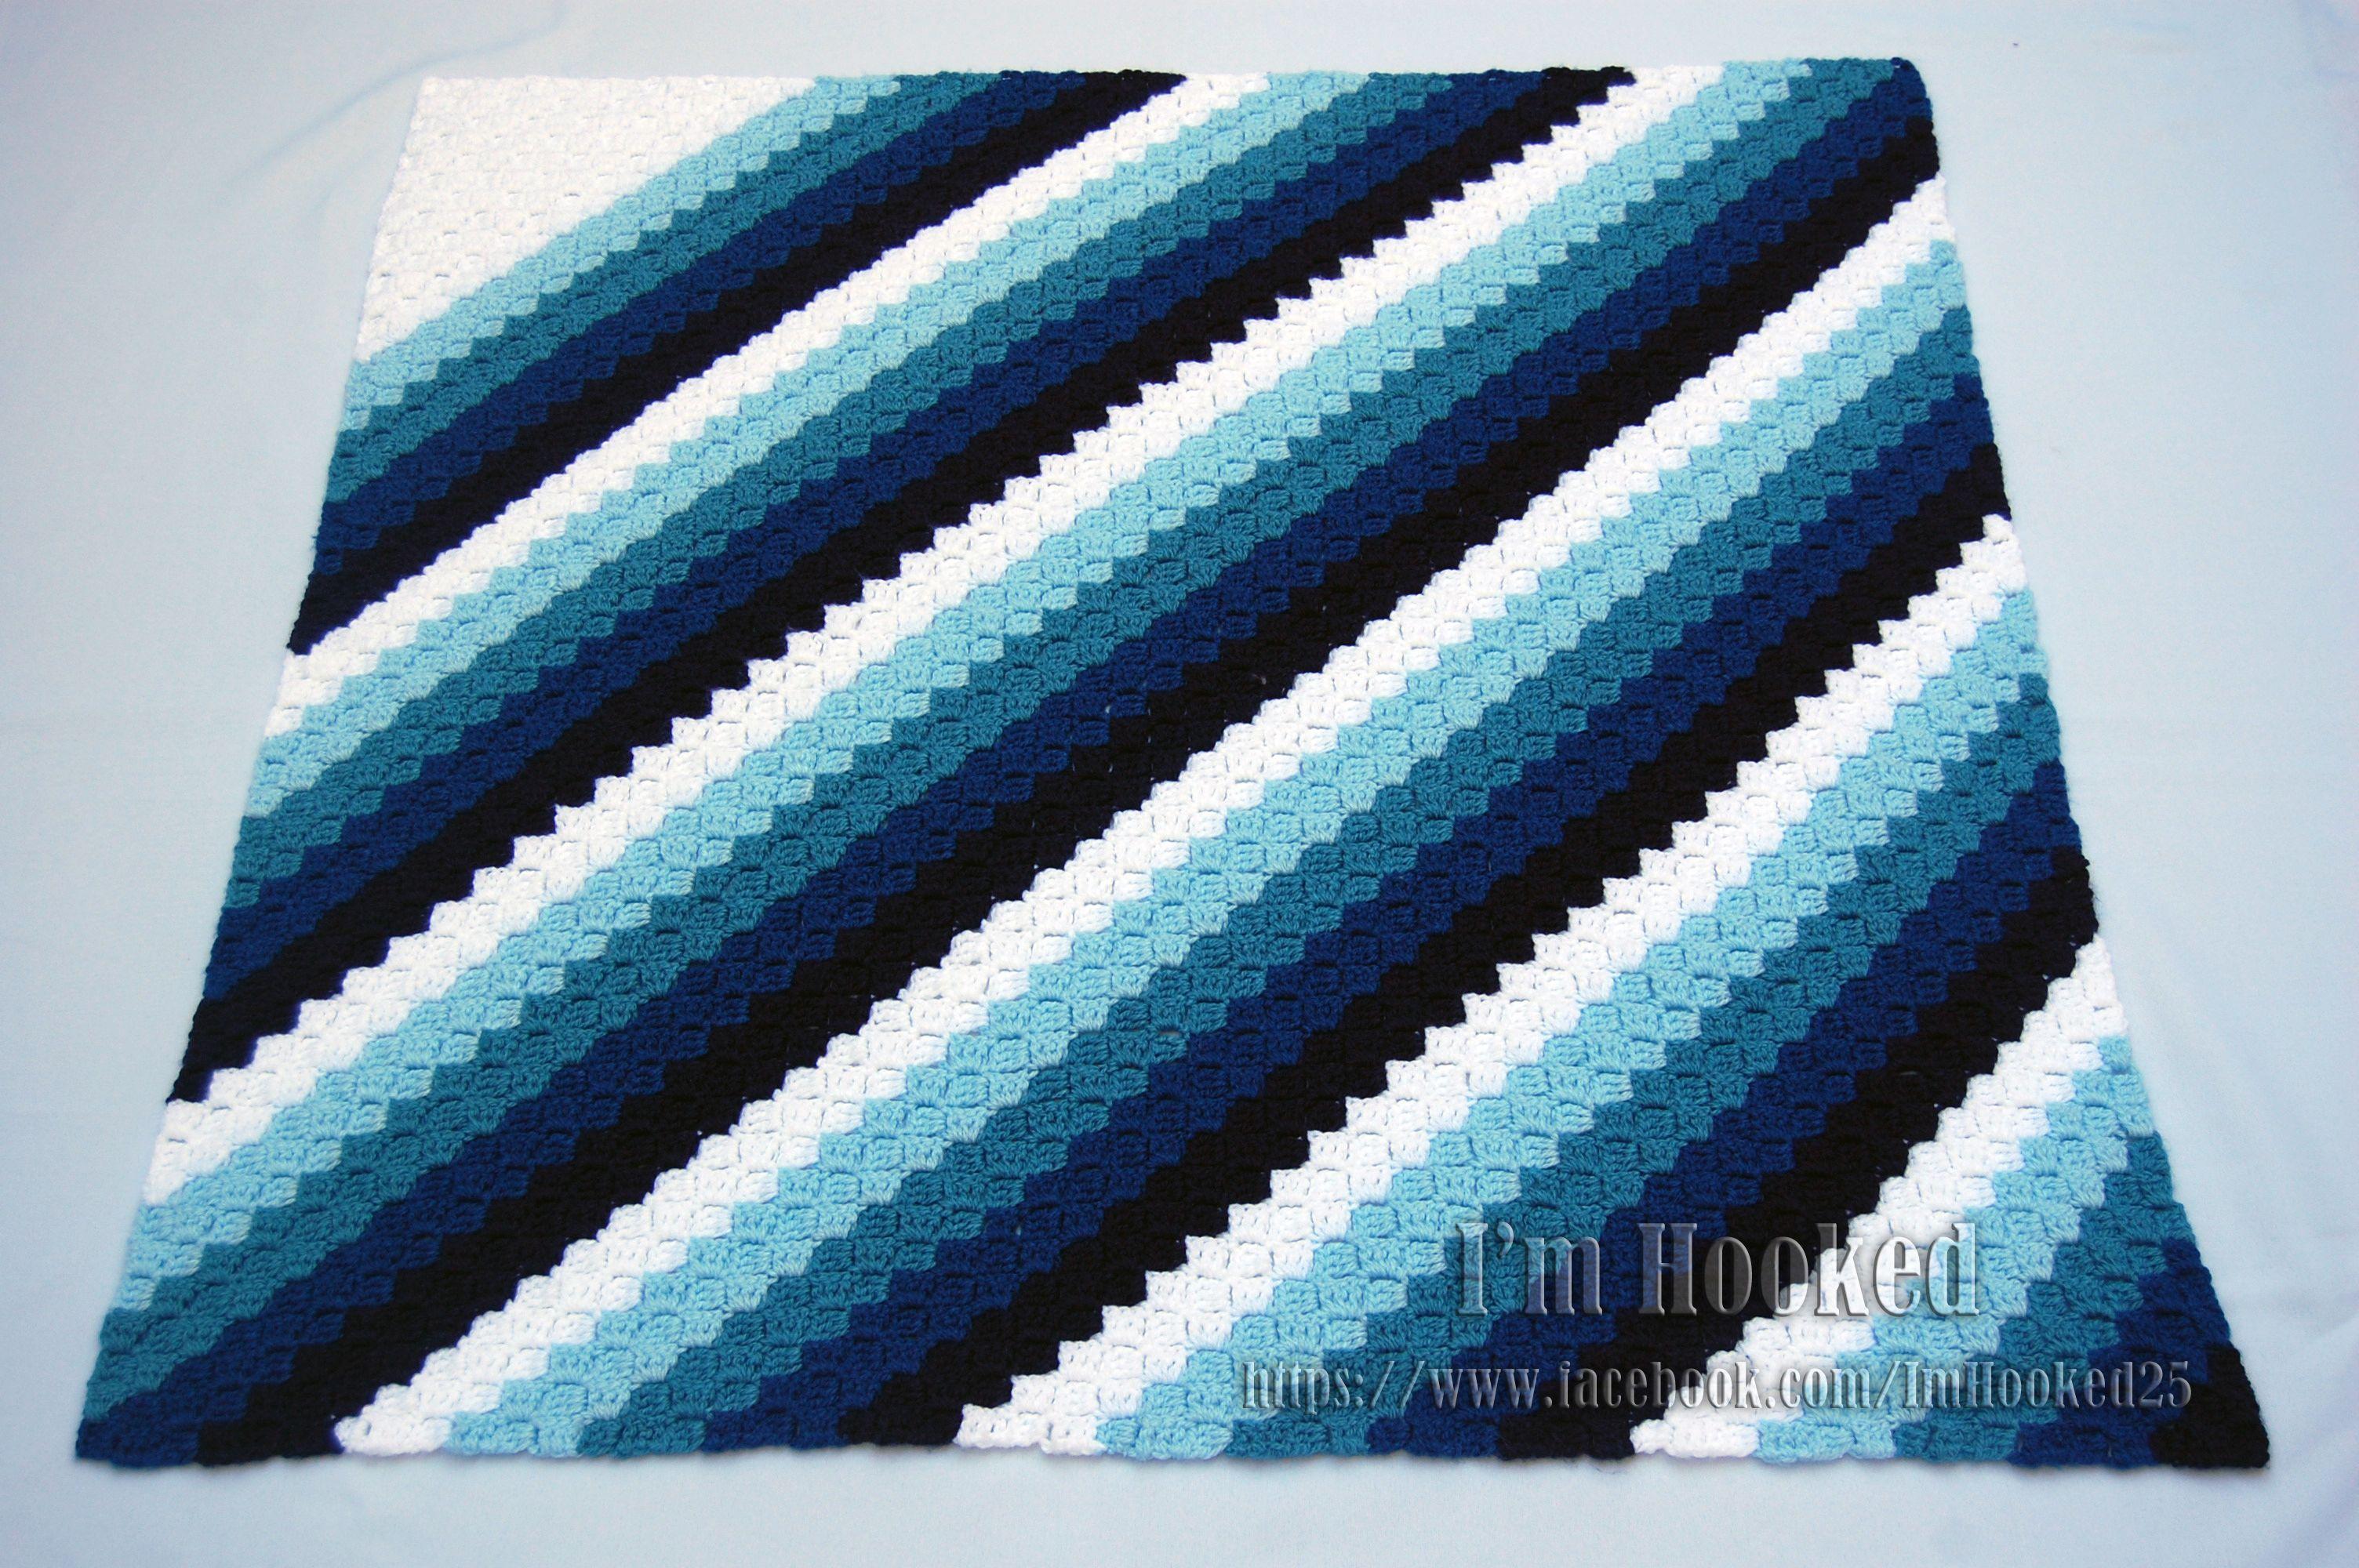 corner to corner afghan in shades of blue | Crochet | Pinterest ...